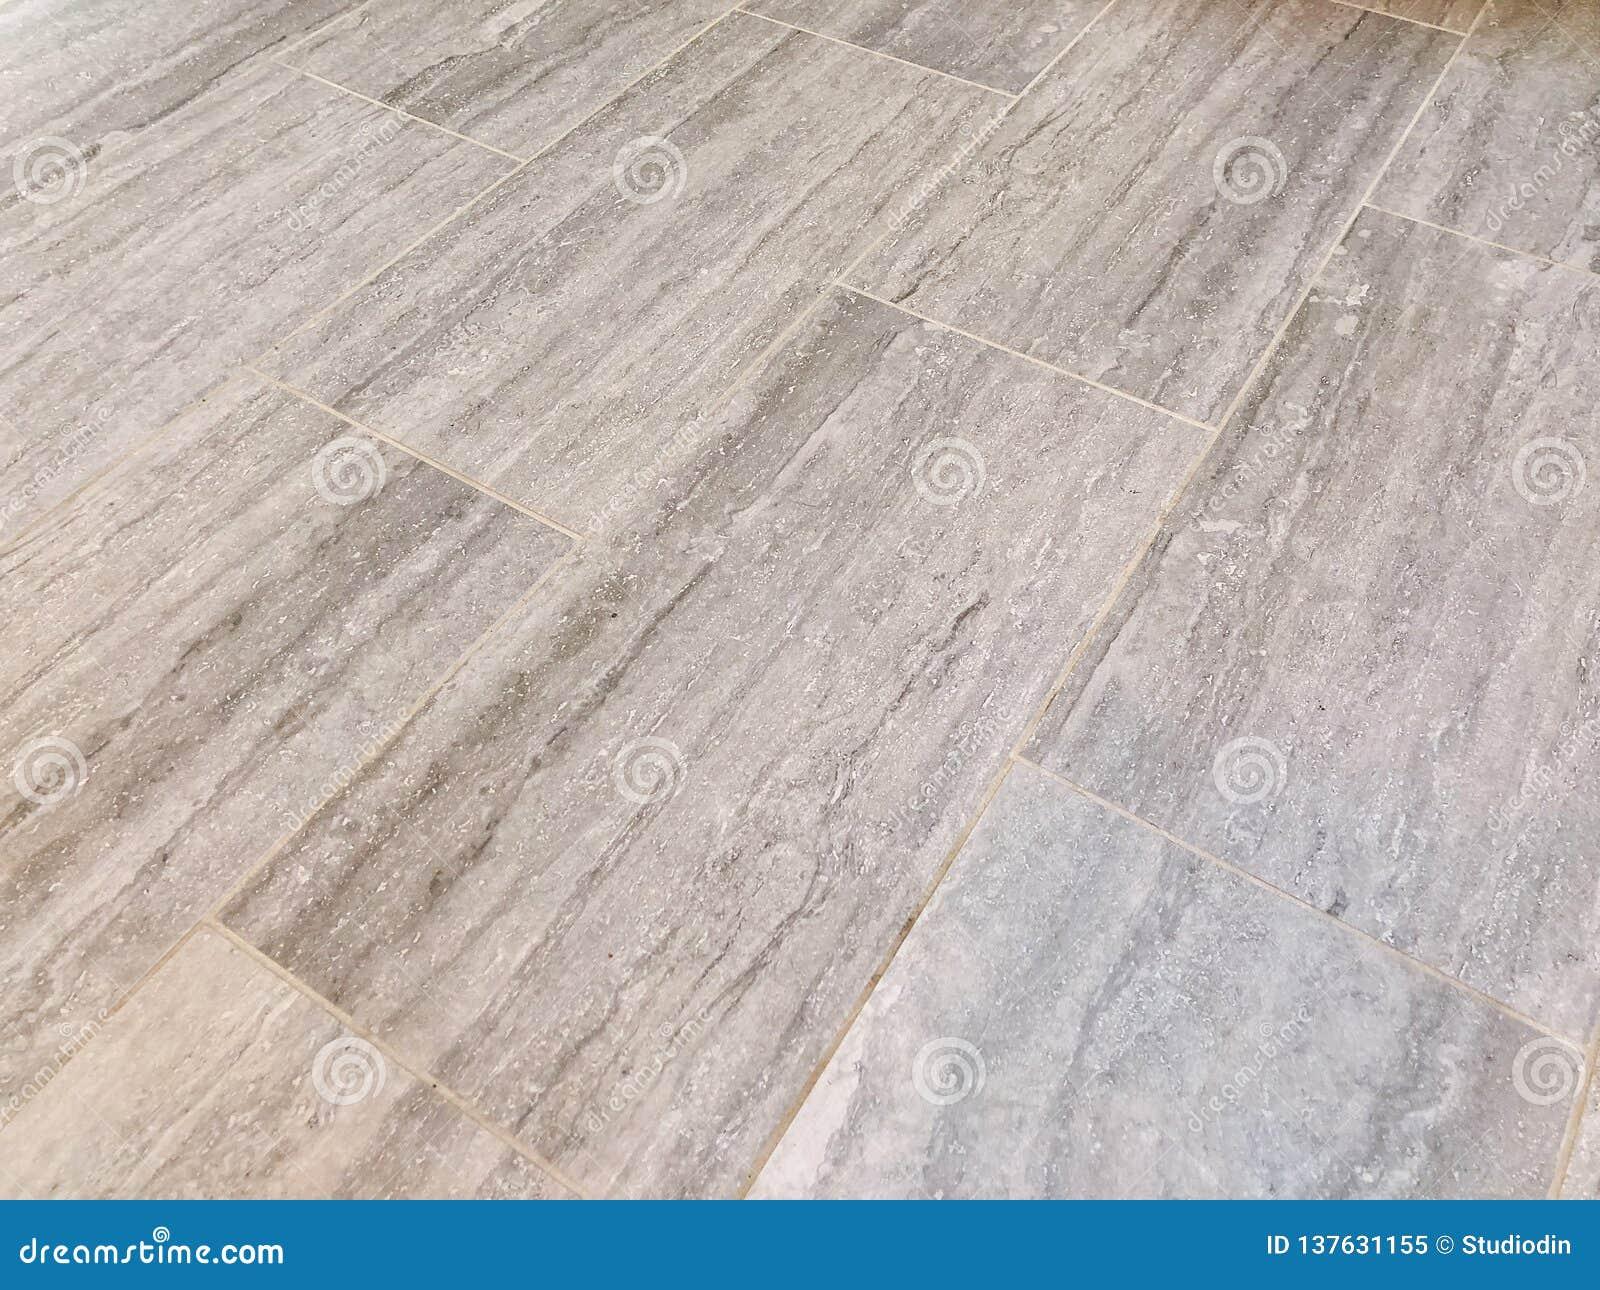 Tile floor newly installed in my bathroom